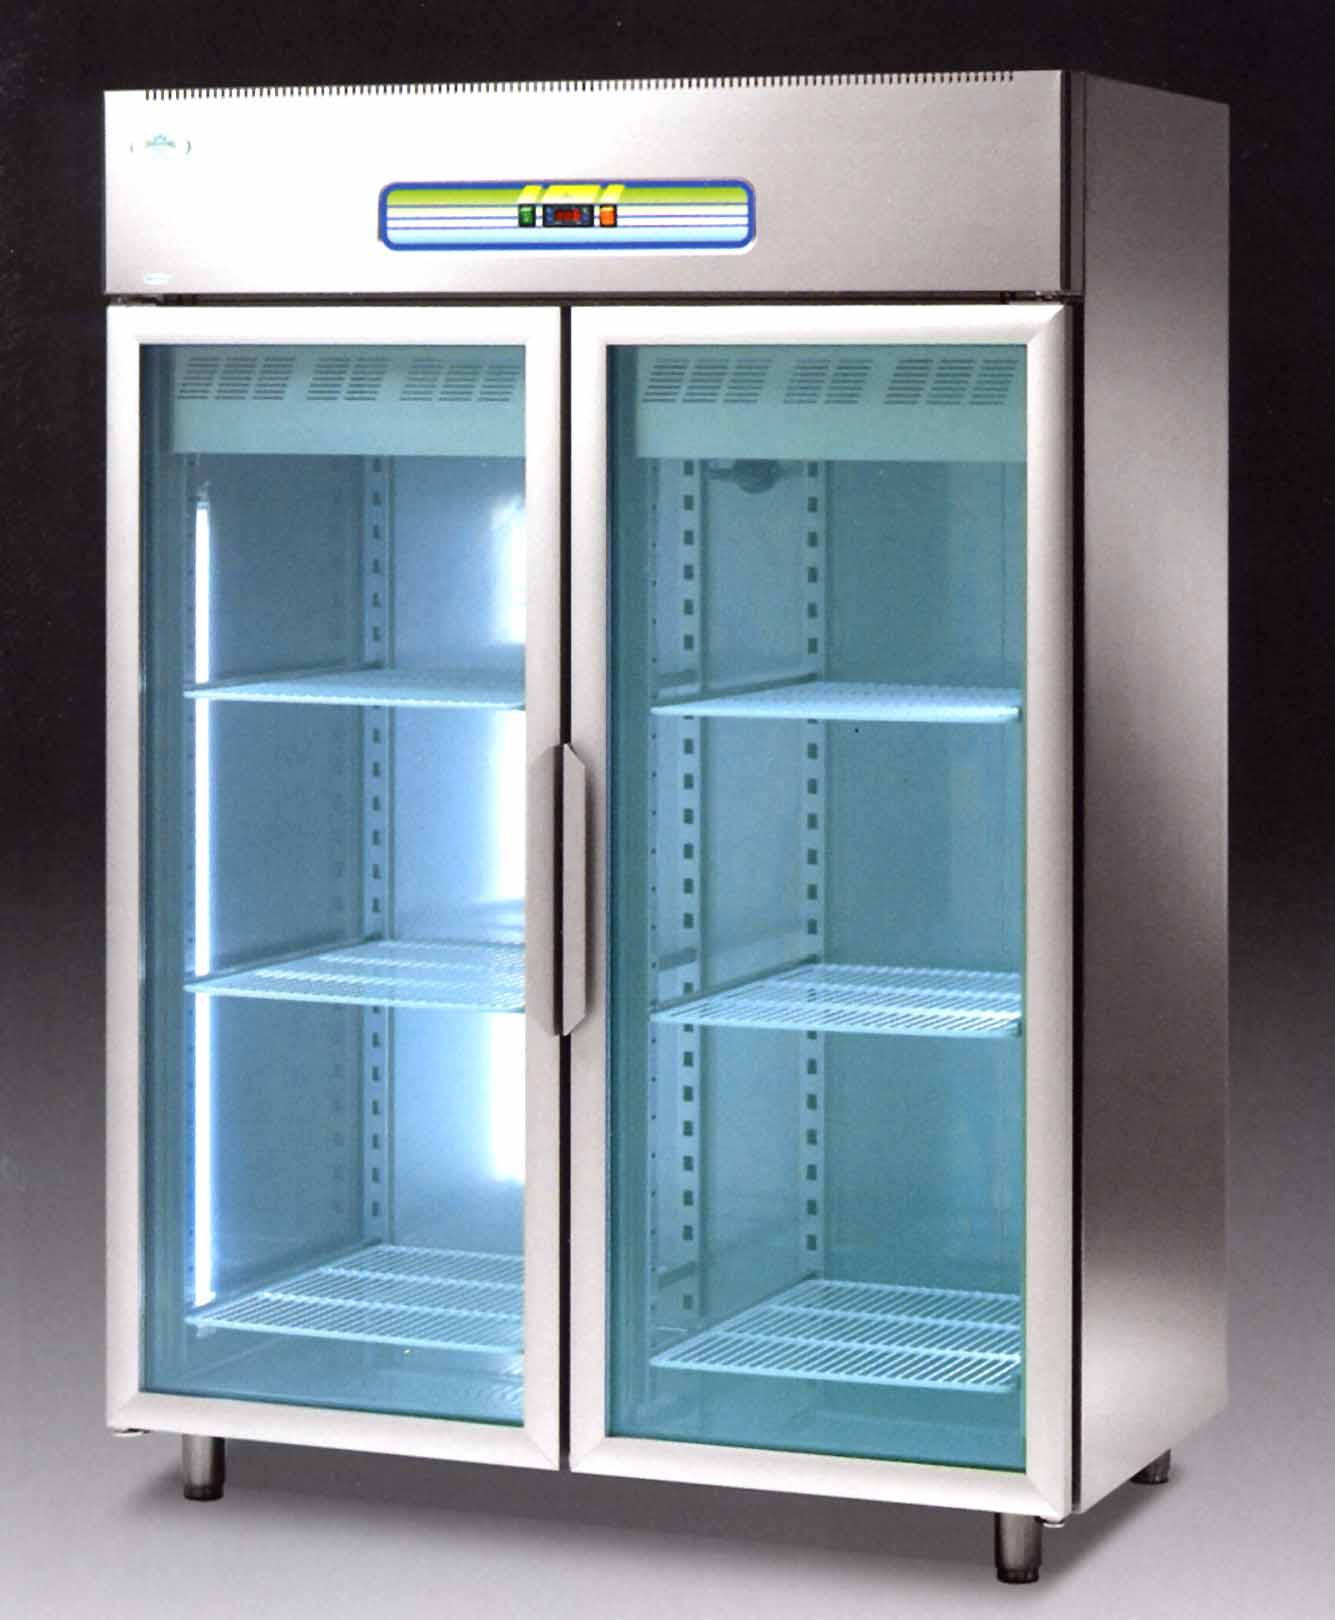 arredamento ristoranti milano | armani frigo milano - Arredamento Industriale Milano